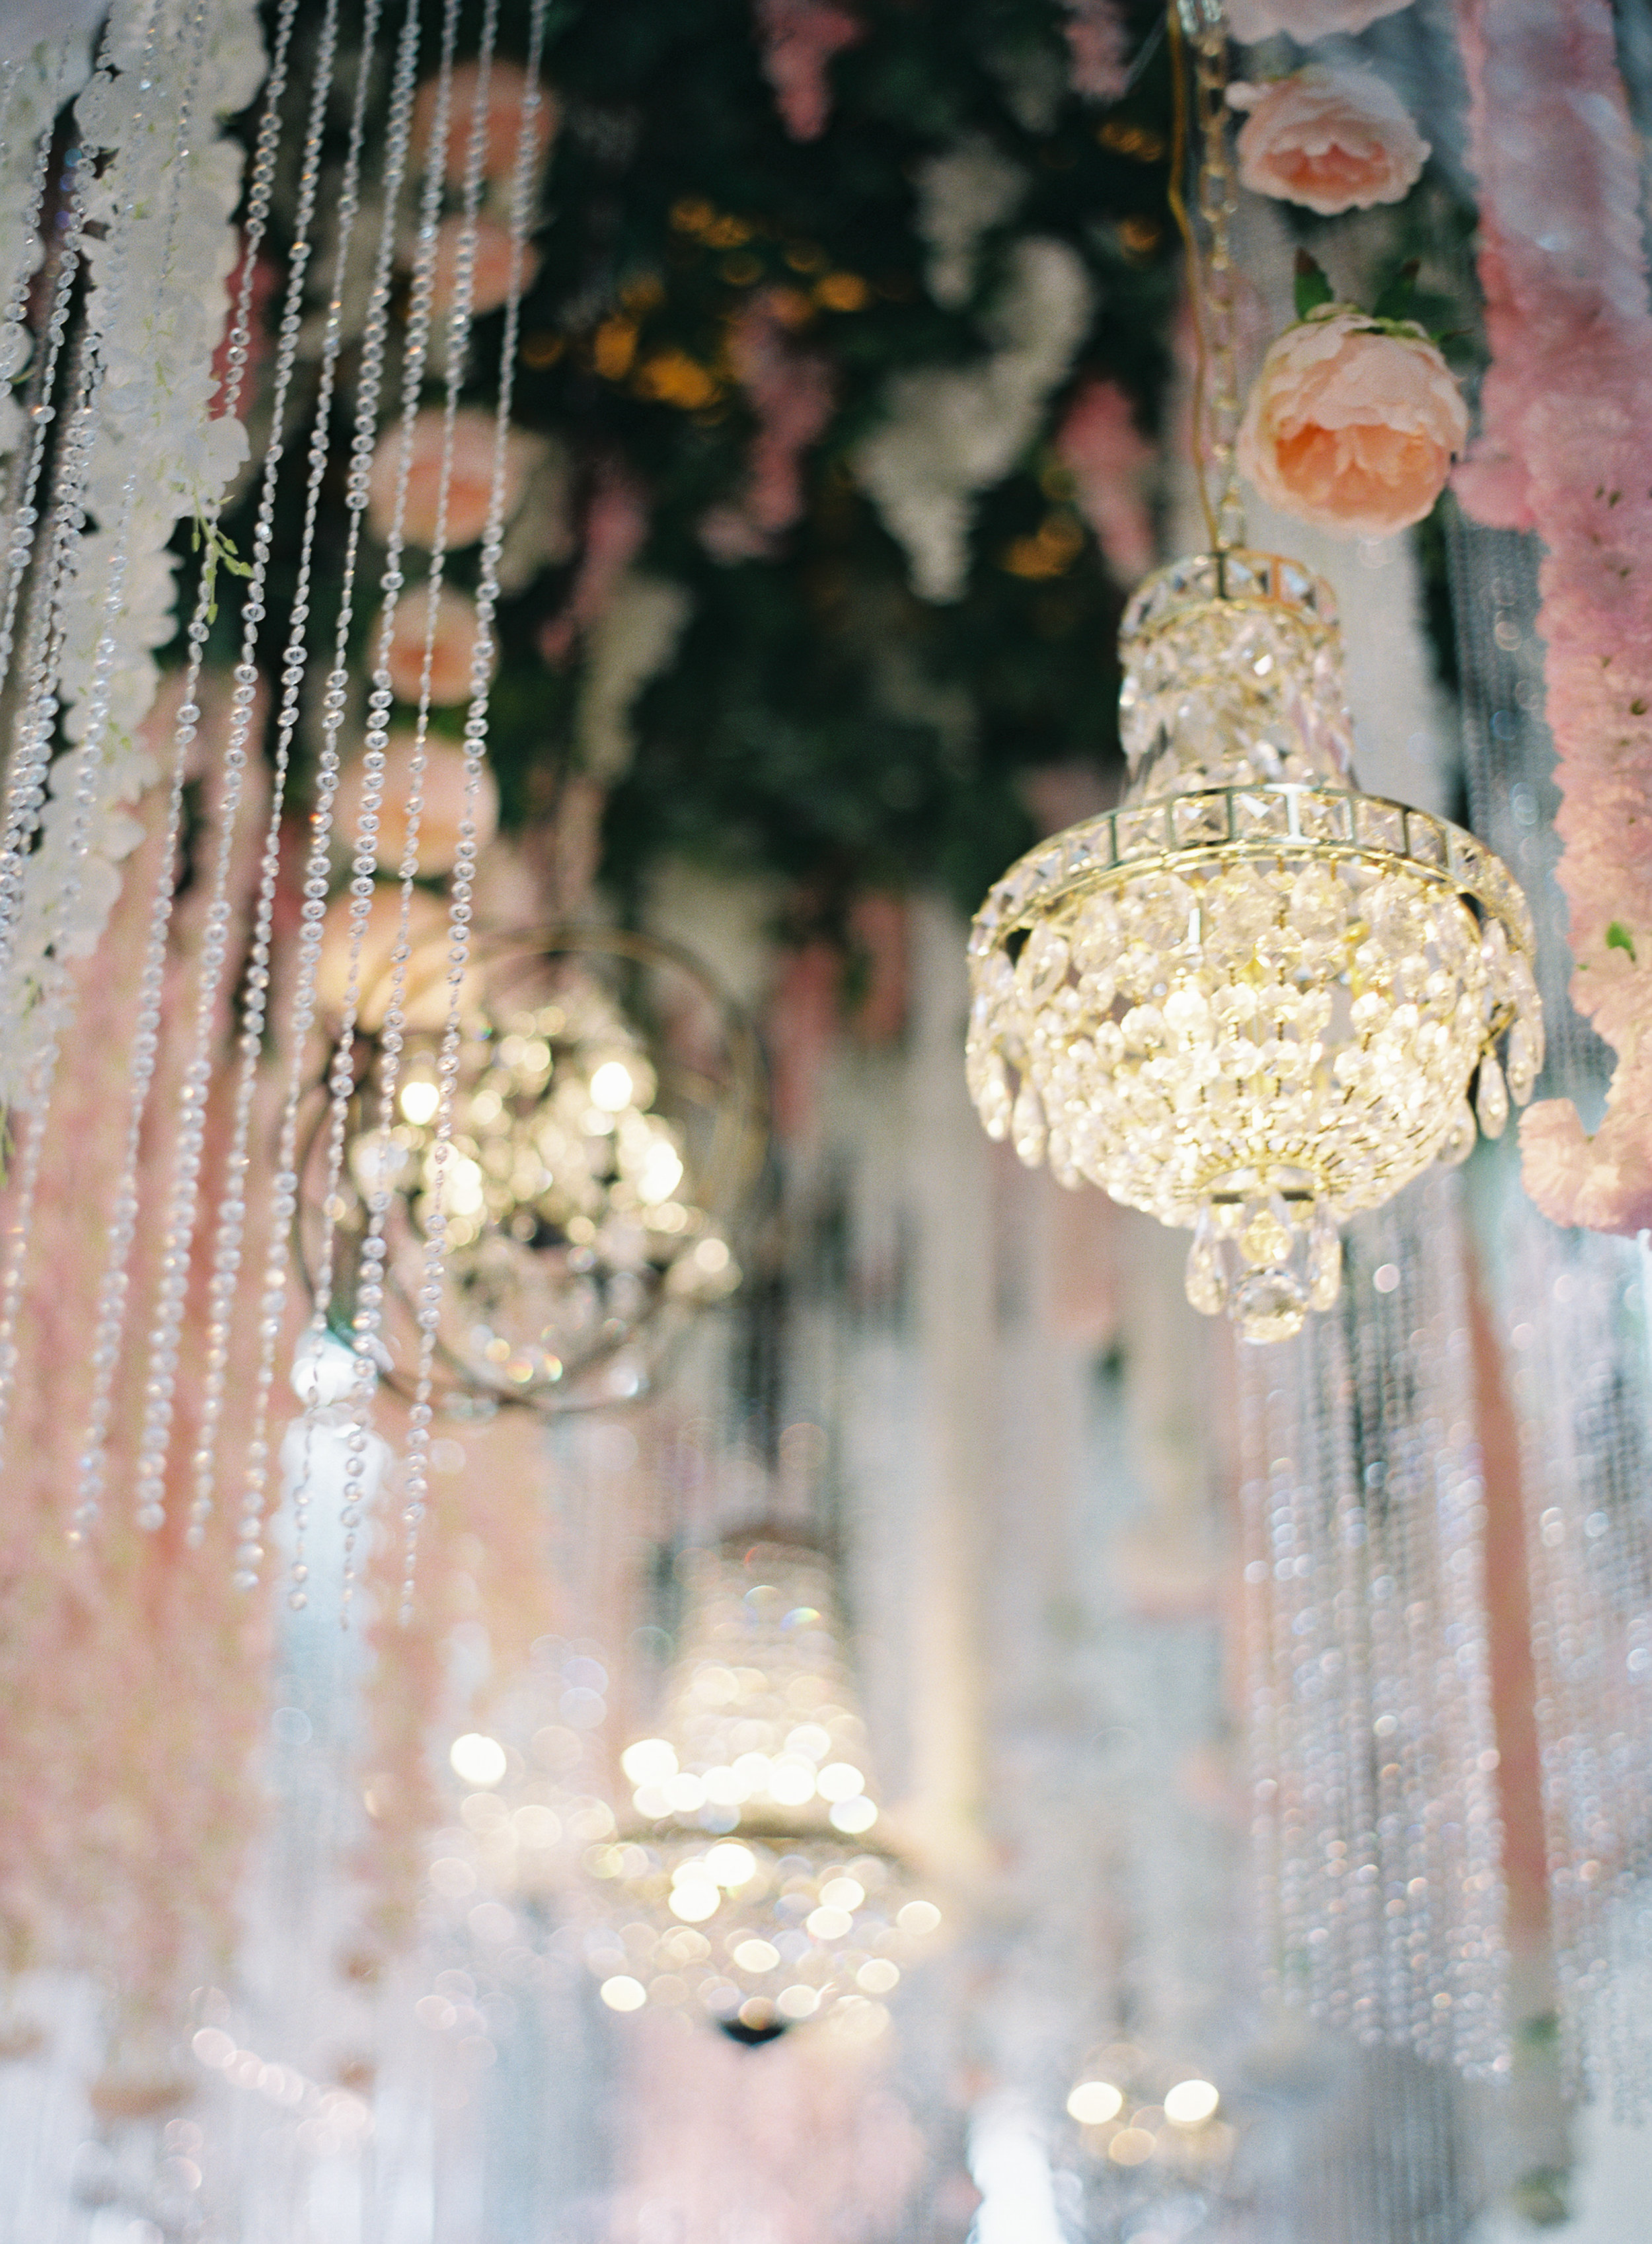 Athenaeum_Wedding_Hi_Res-76-Jen_Huang-005195-R1-012.jpg